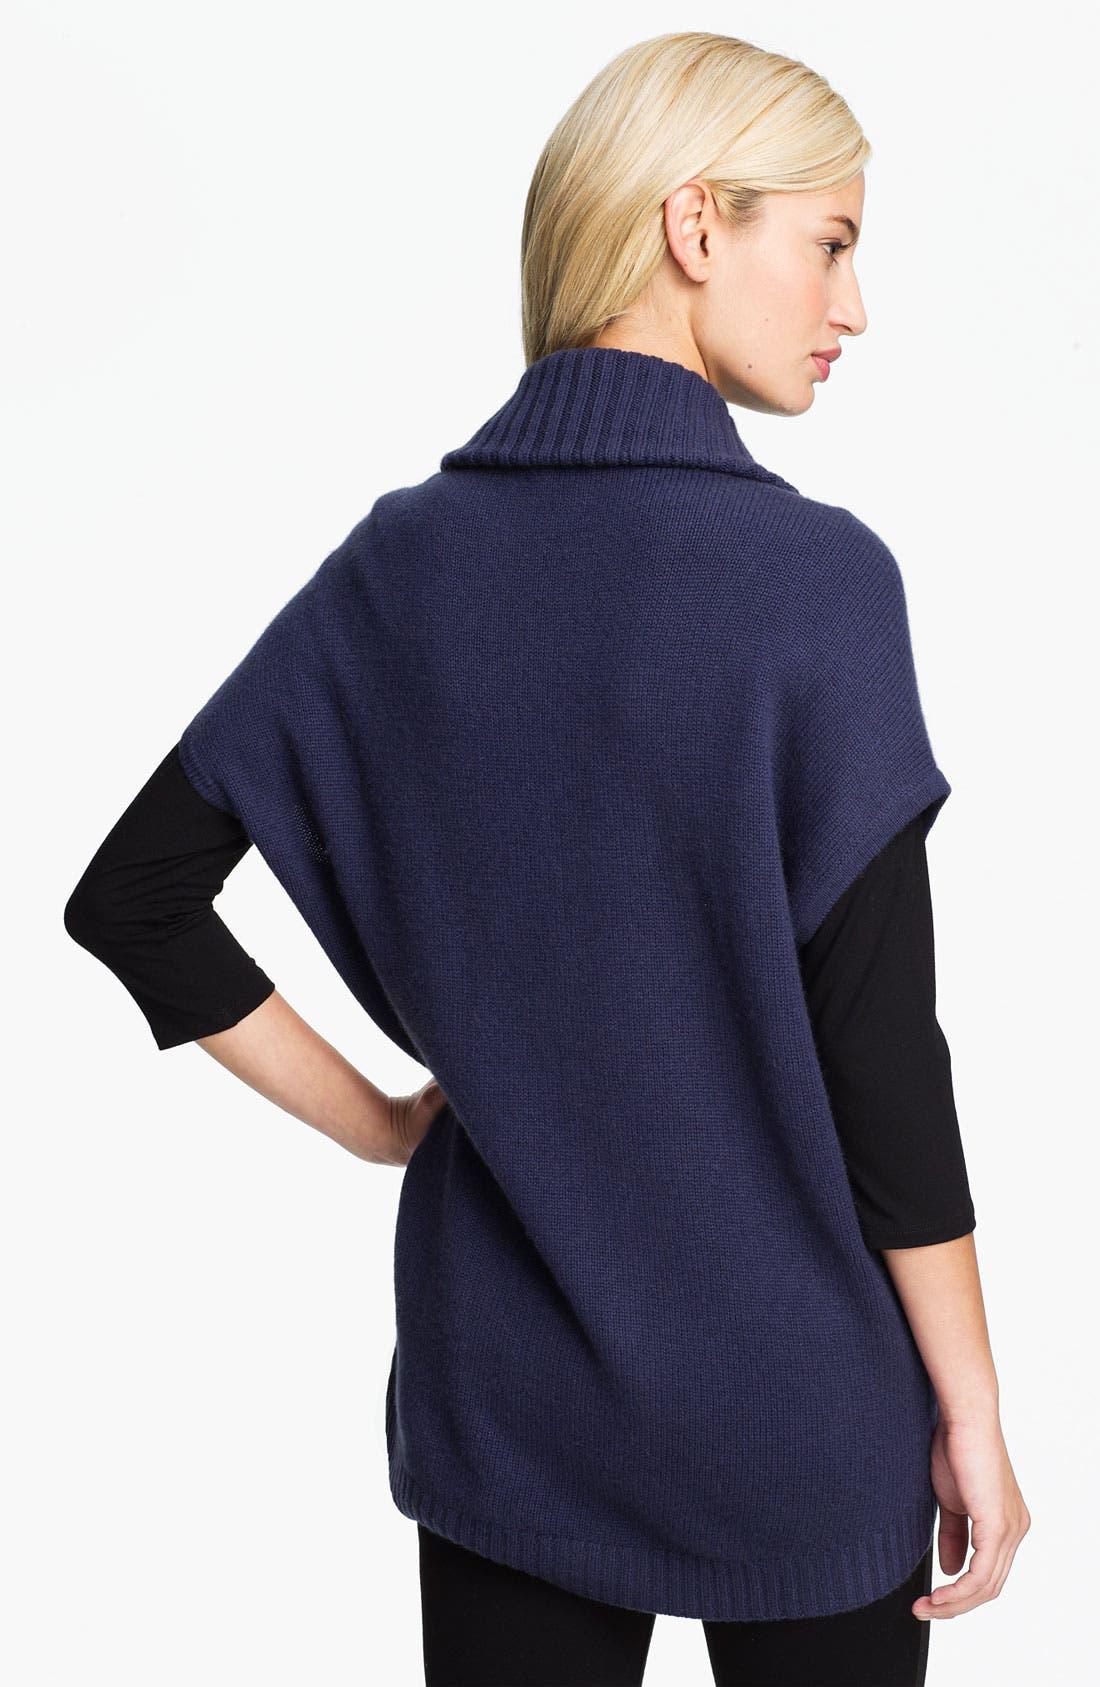 Alternate Image 2  - Christopher Fischer 'Hyacinth' Cashmere Sweater Jacket (Online Exclusive)